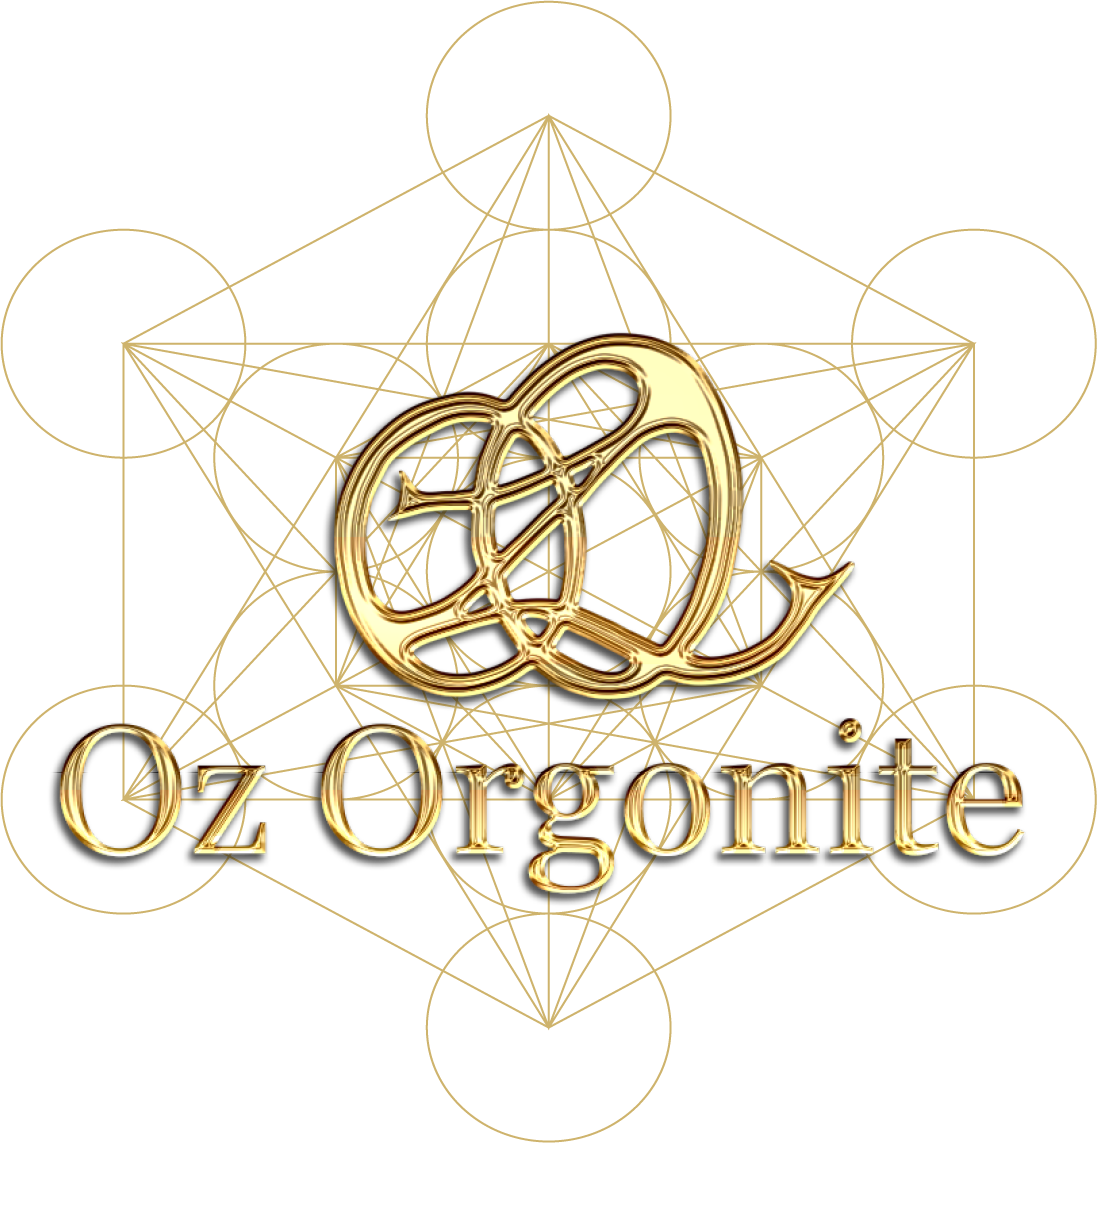 Oz_Orgonite_Logo_Metatron_ohne-schrift57d7d94410134